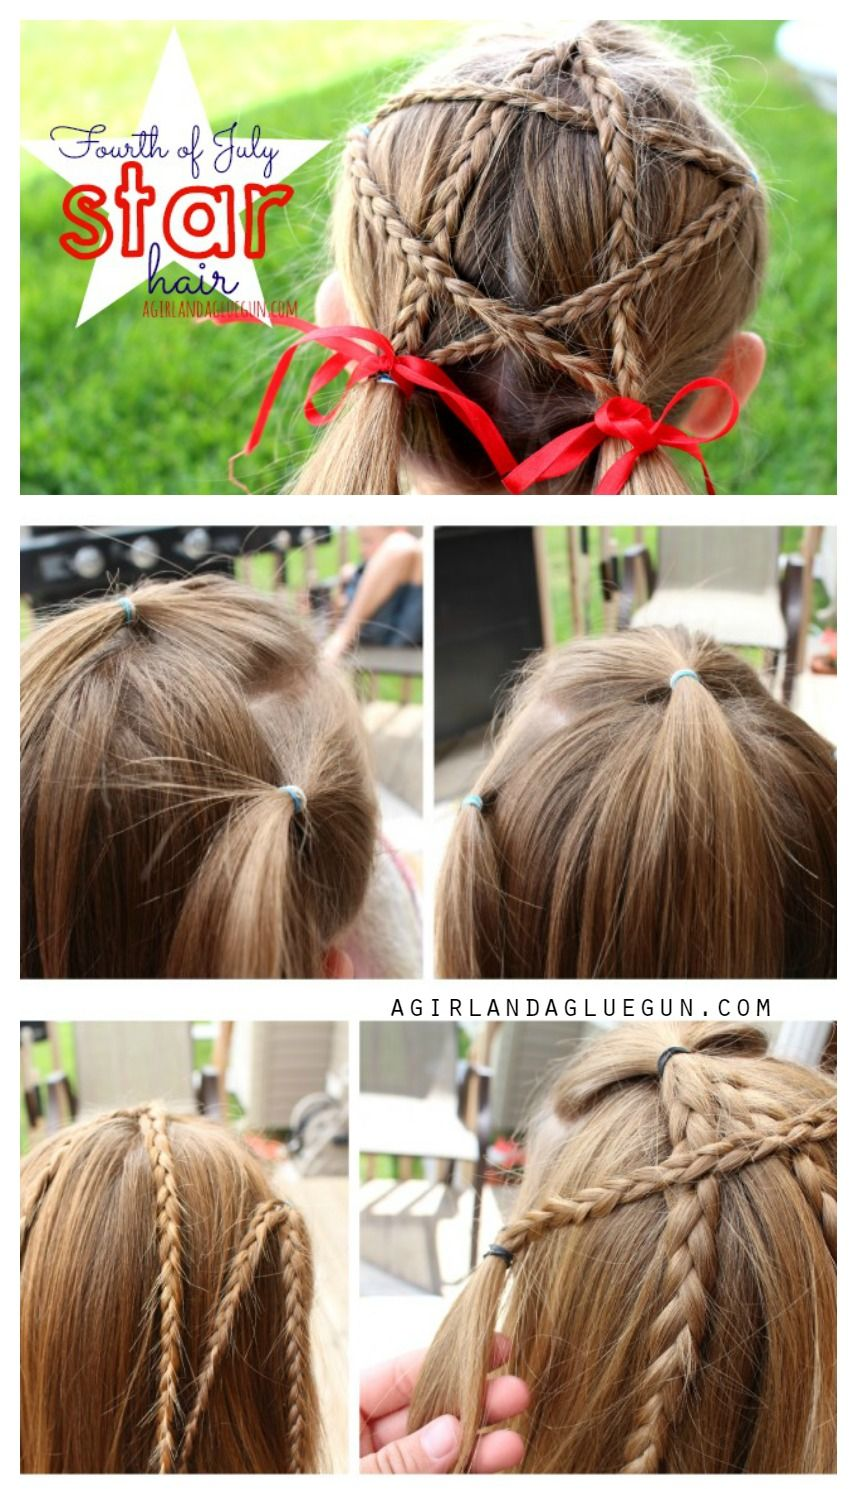 fourth of july star hair